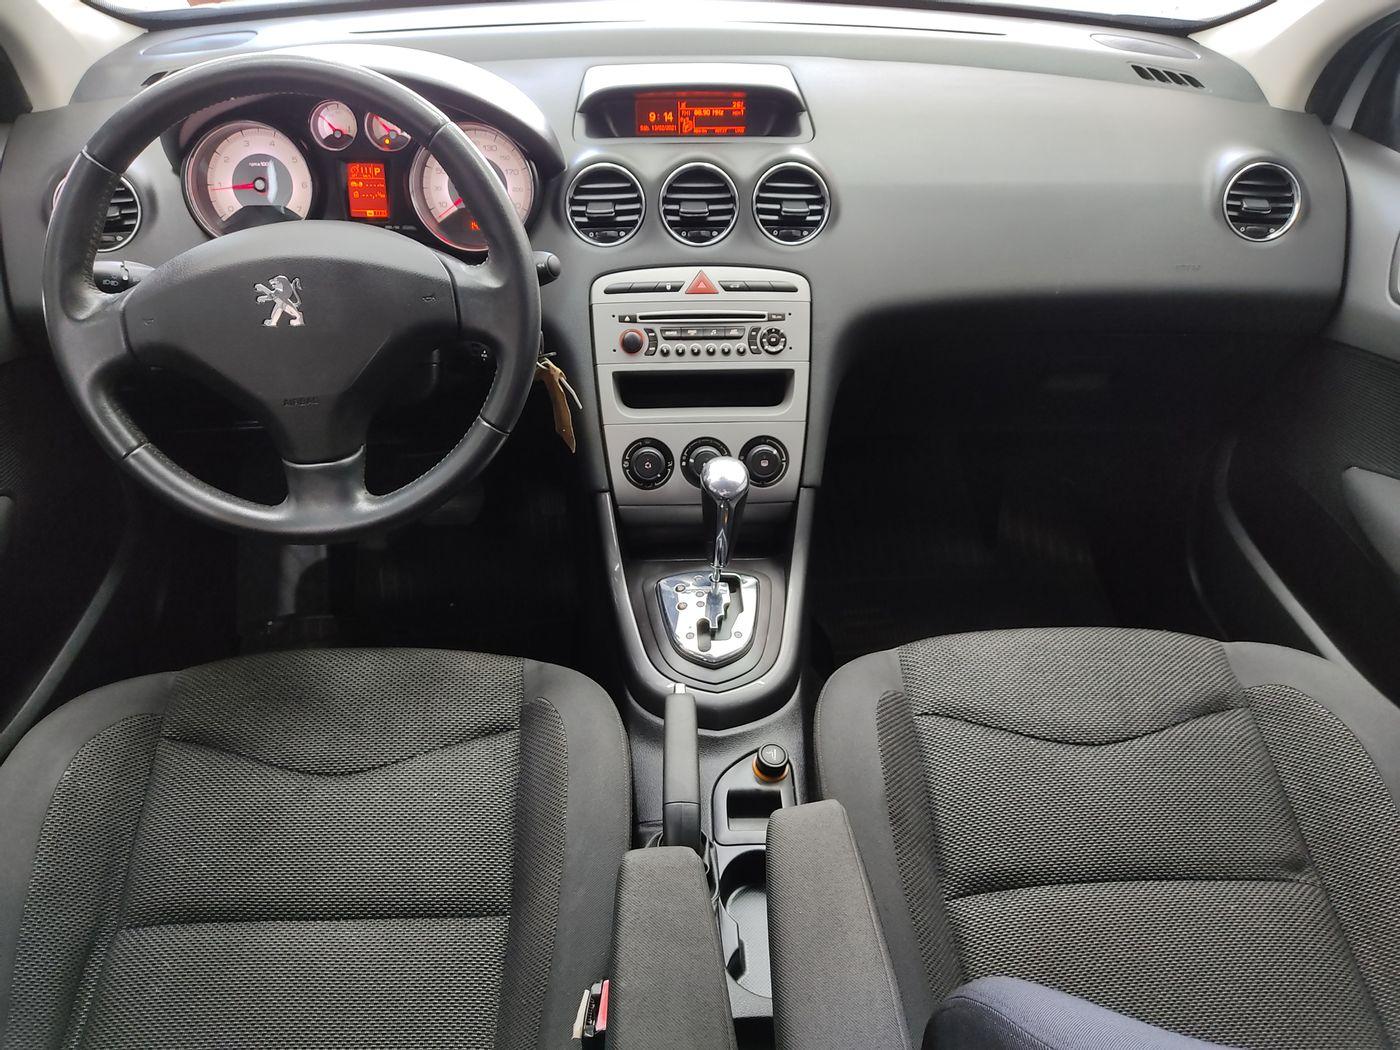 Peugeot 408 Sedan Allure 2.0 Flex 16V 4p Aut.